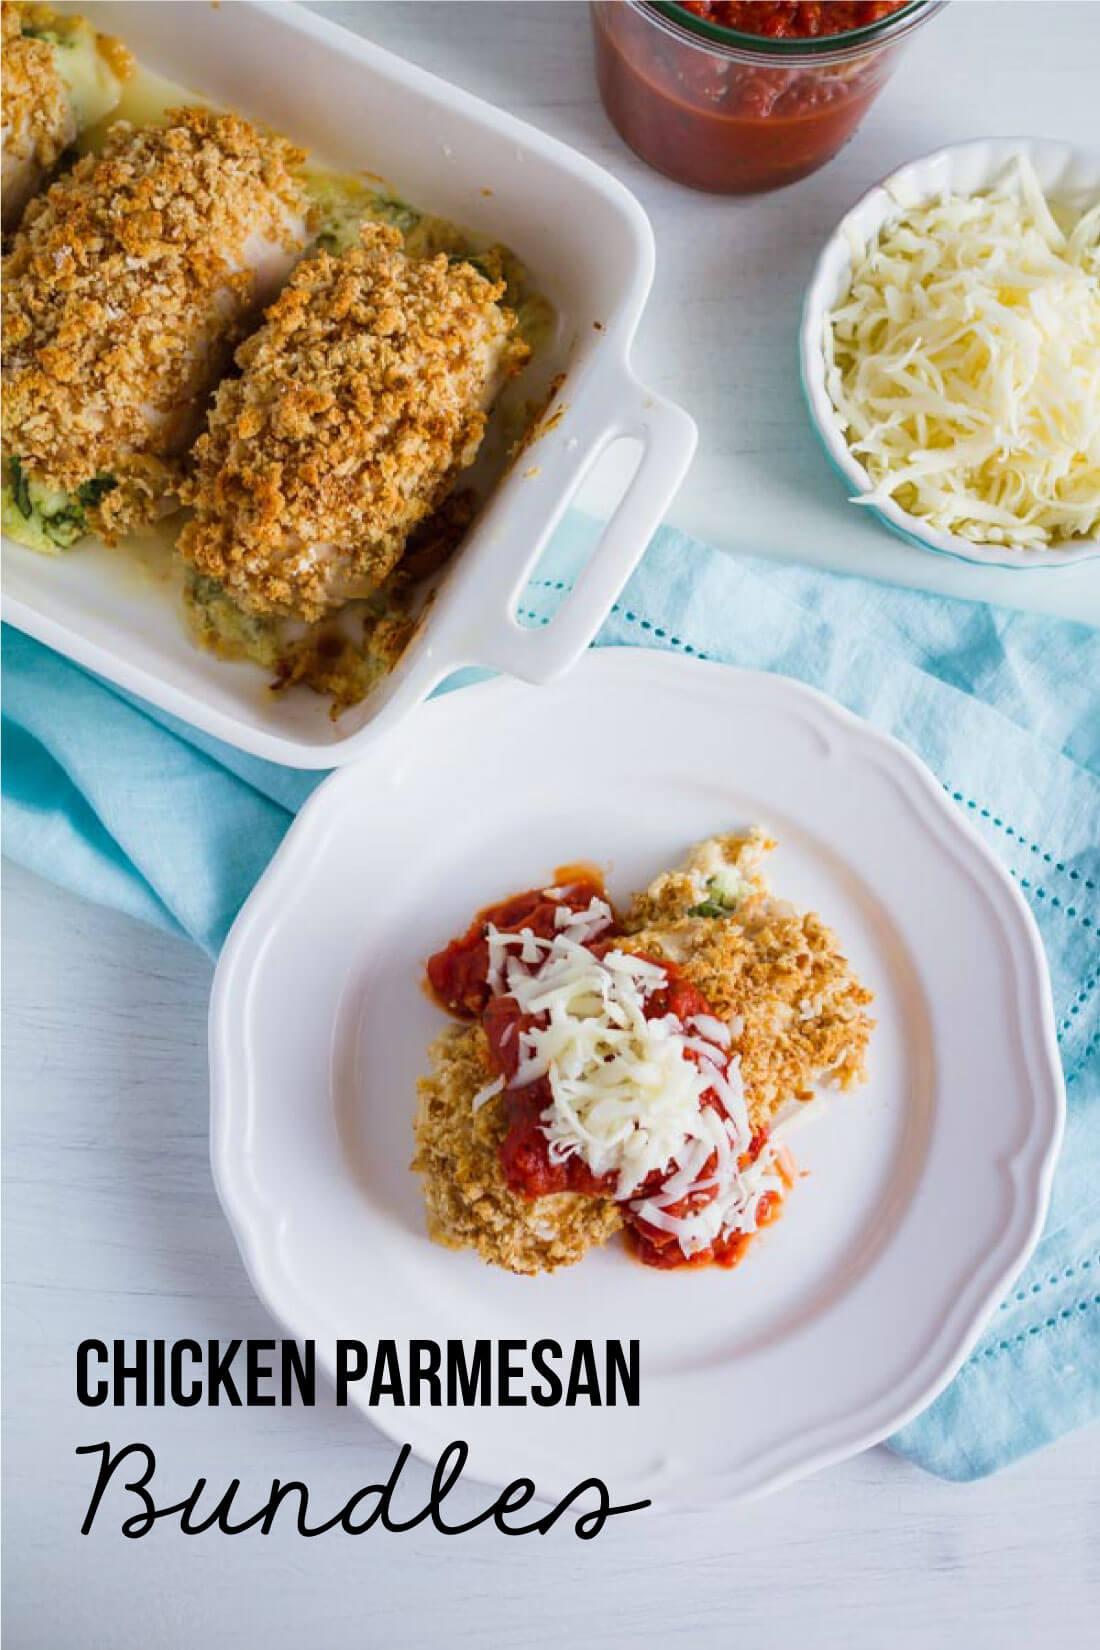 Chicken Parmesan Bundles - make this amazing main dish recipe. www.thirtyhandmadedays.com